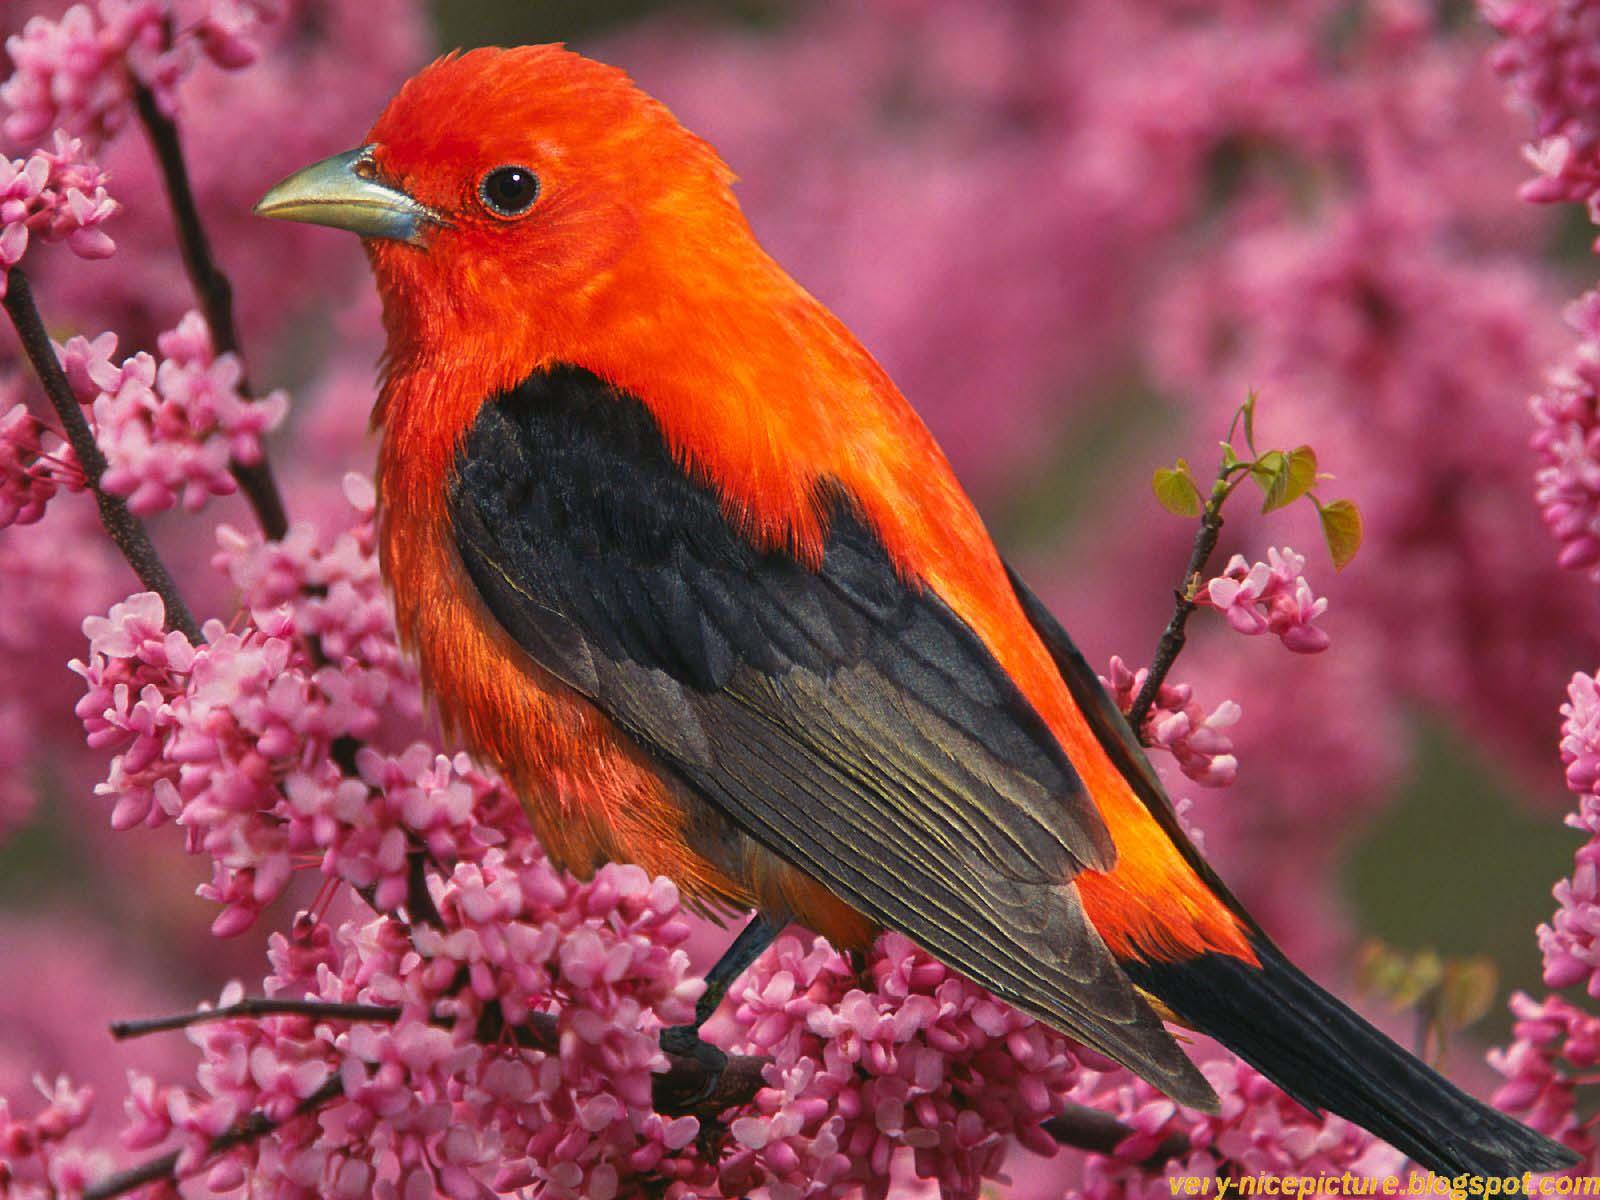 Nice Wallpapers, Beautiful Birds pictures, Natural Wallpapers | Nice Wallpapers, Animals, 3D ...